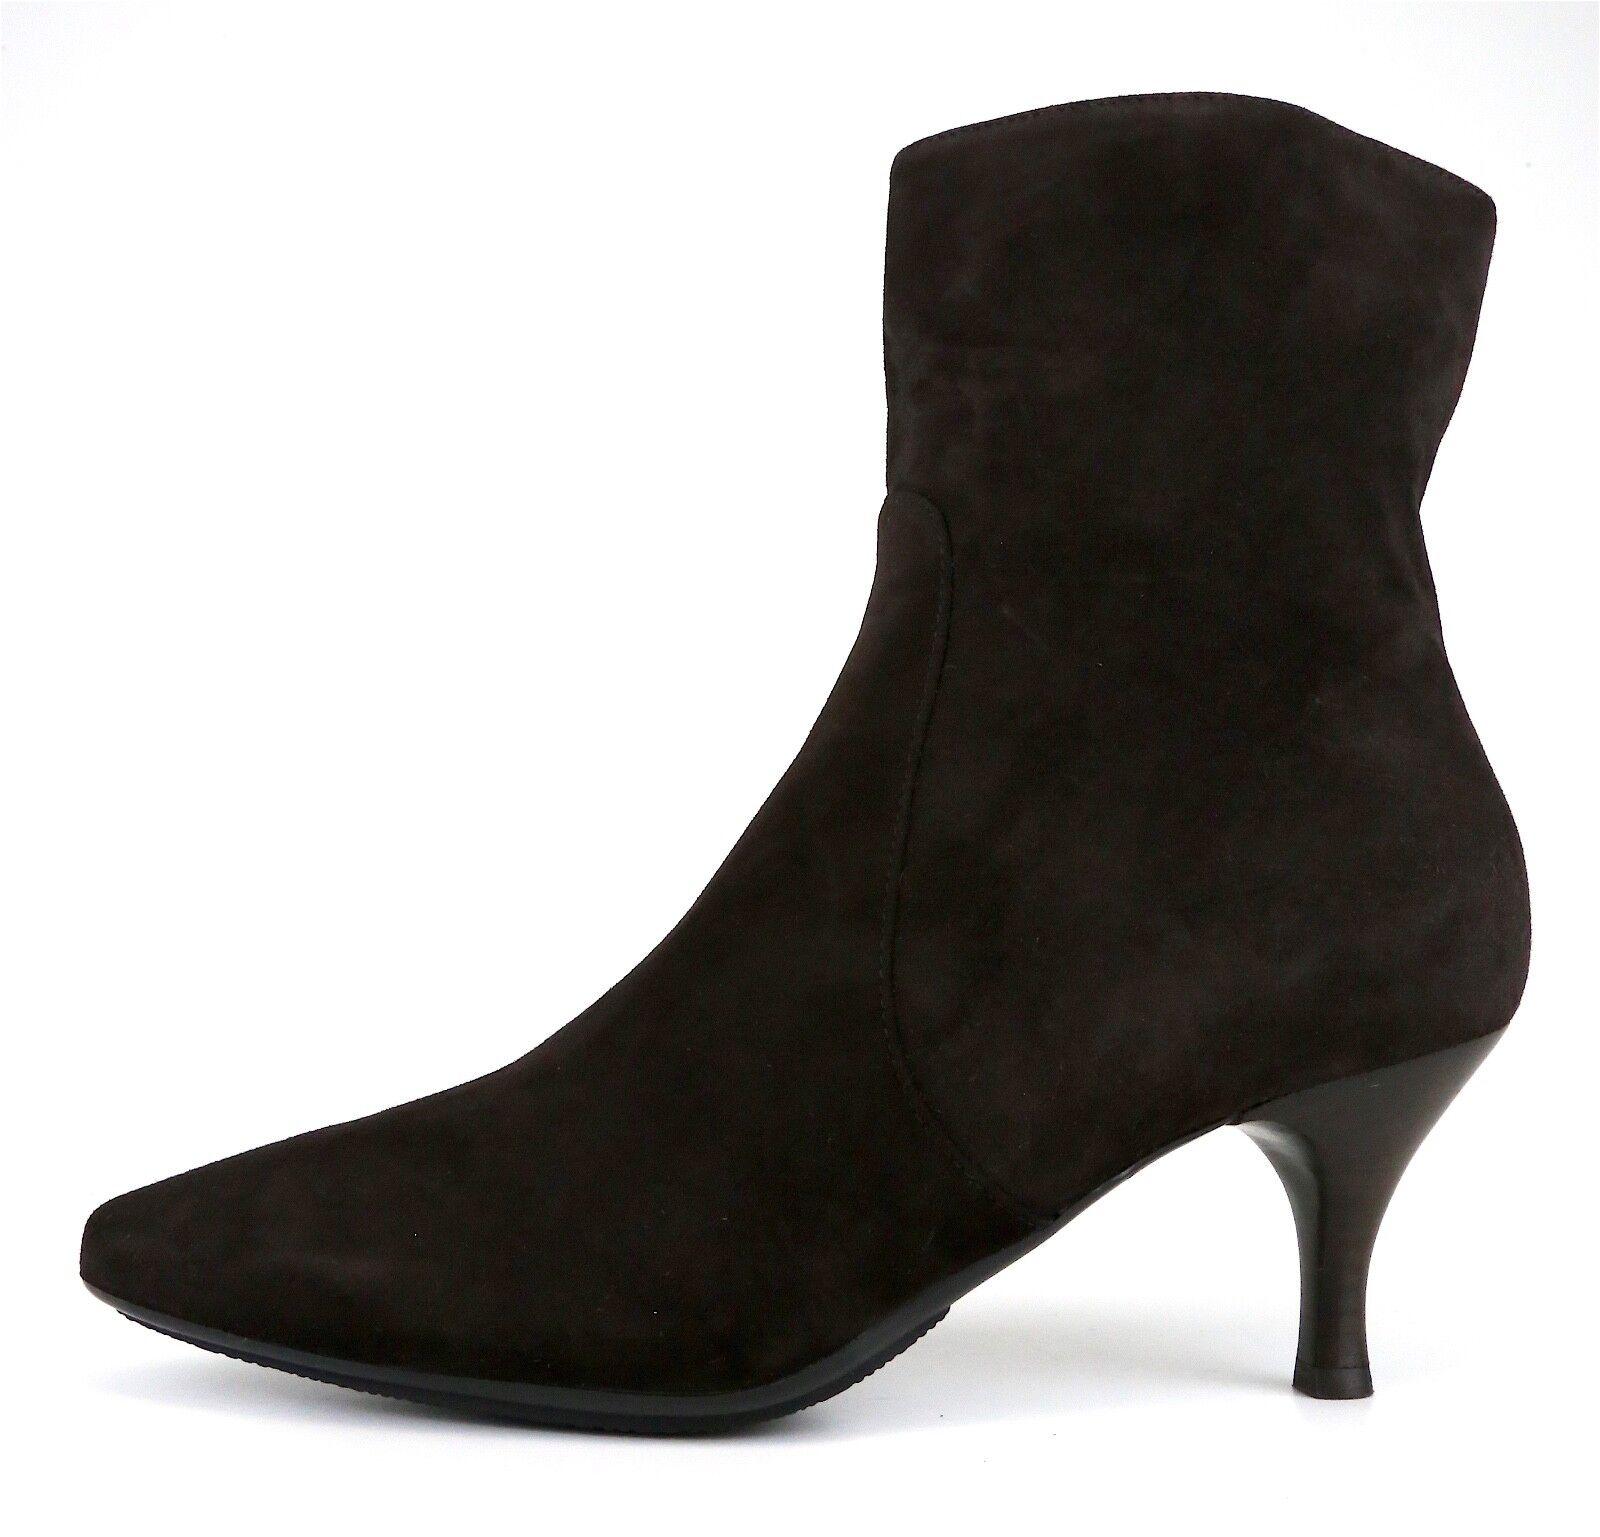 Aquatalia By Marvin K. Side Zip Suede Ankle Boot Brown Women Sz 9.5 5272